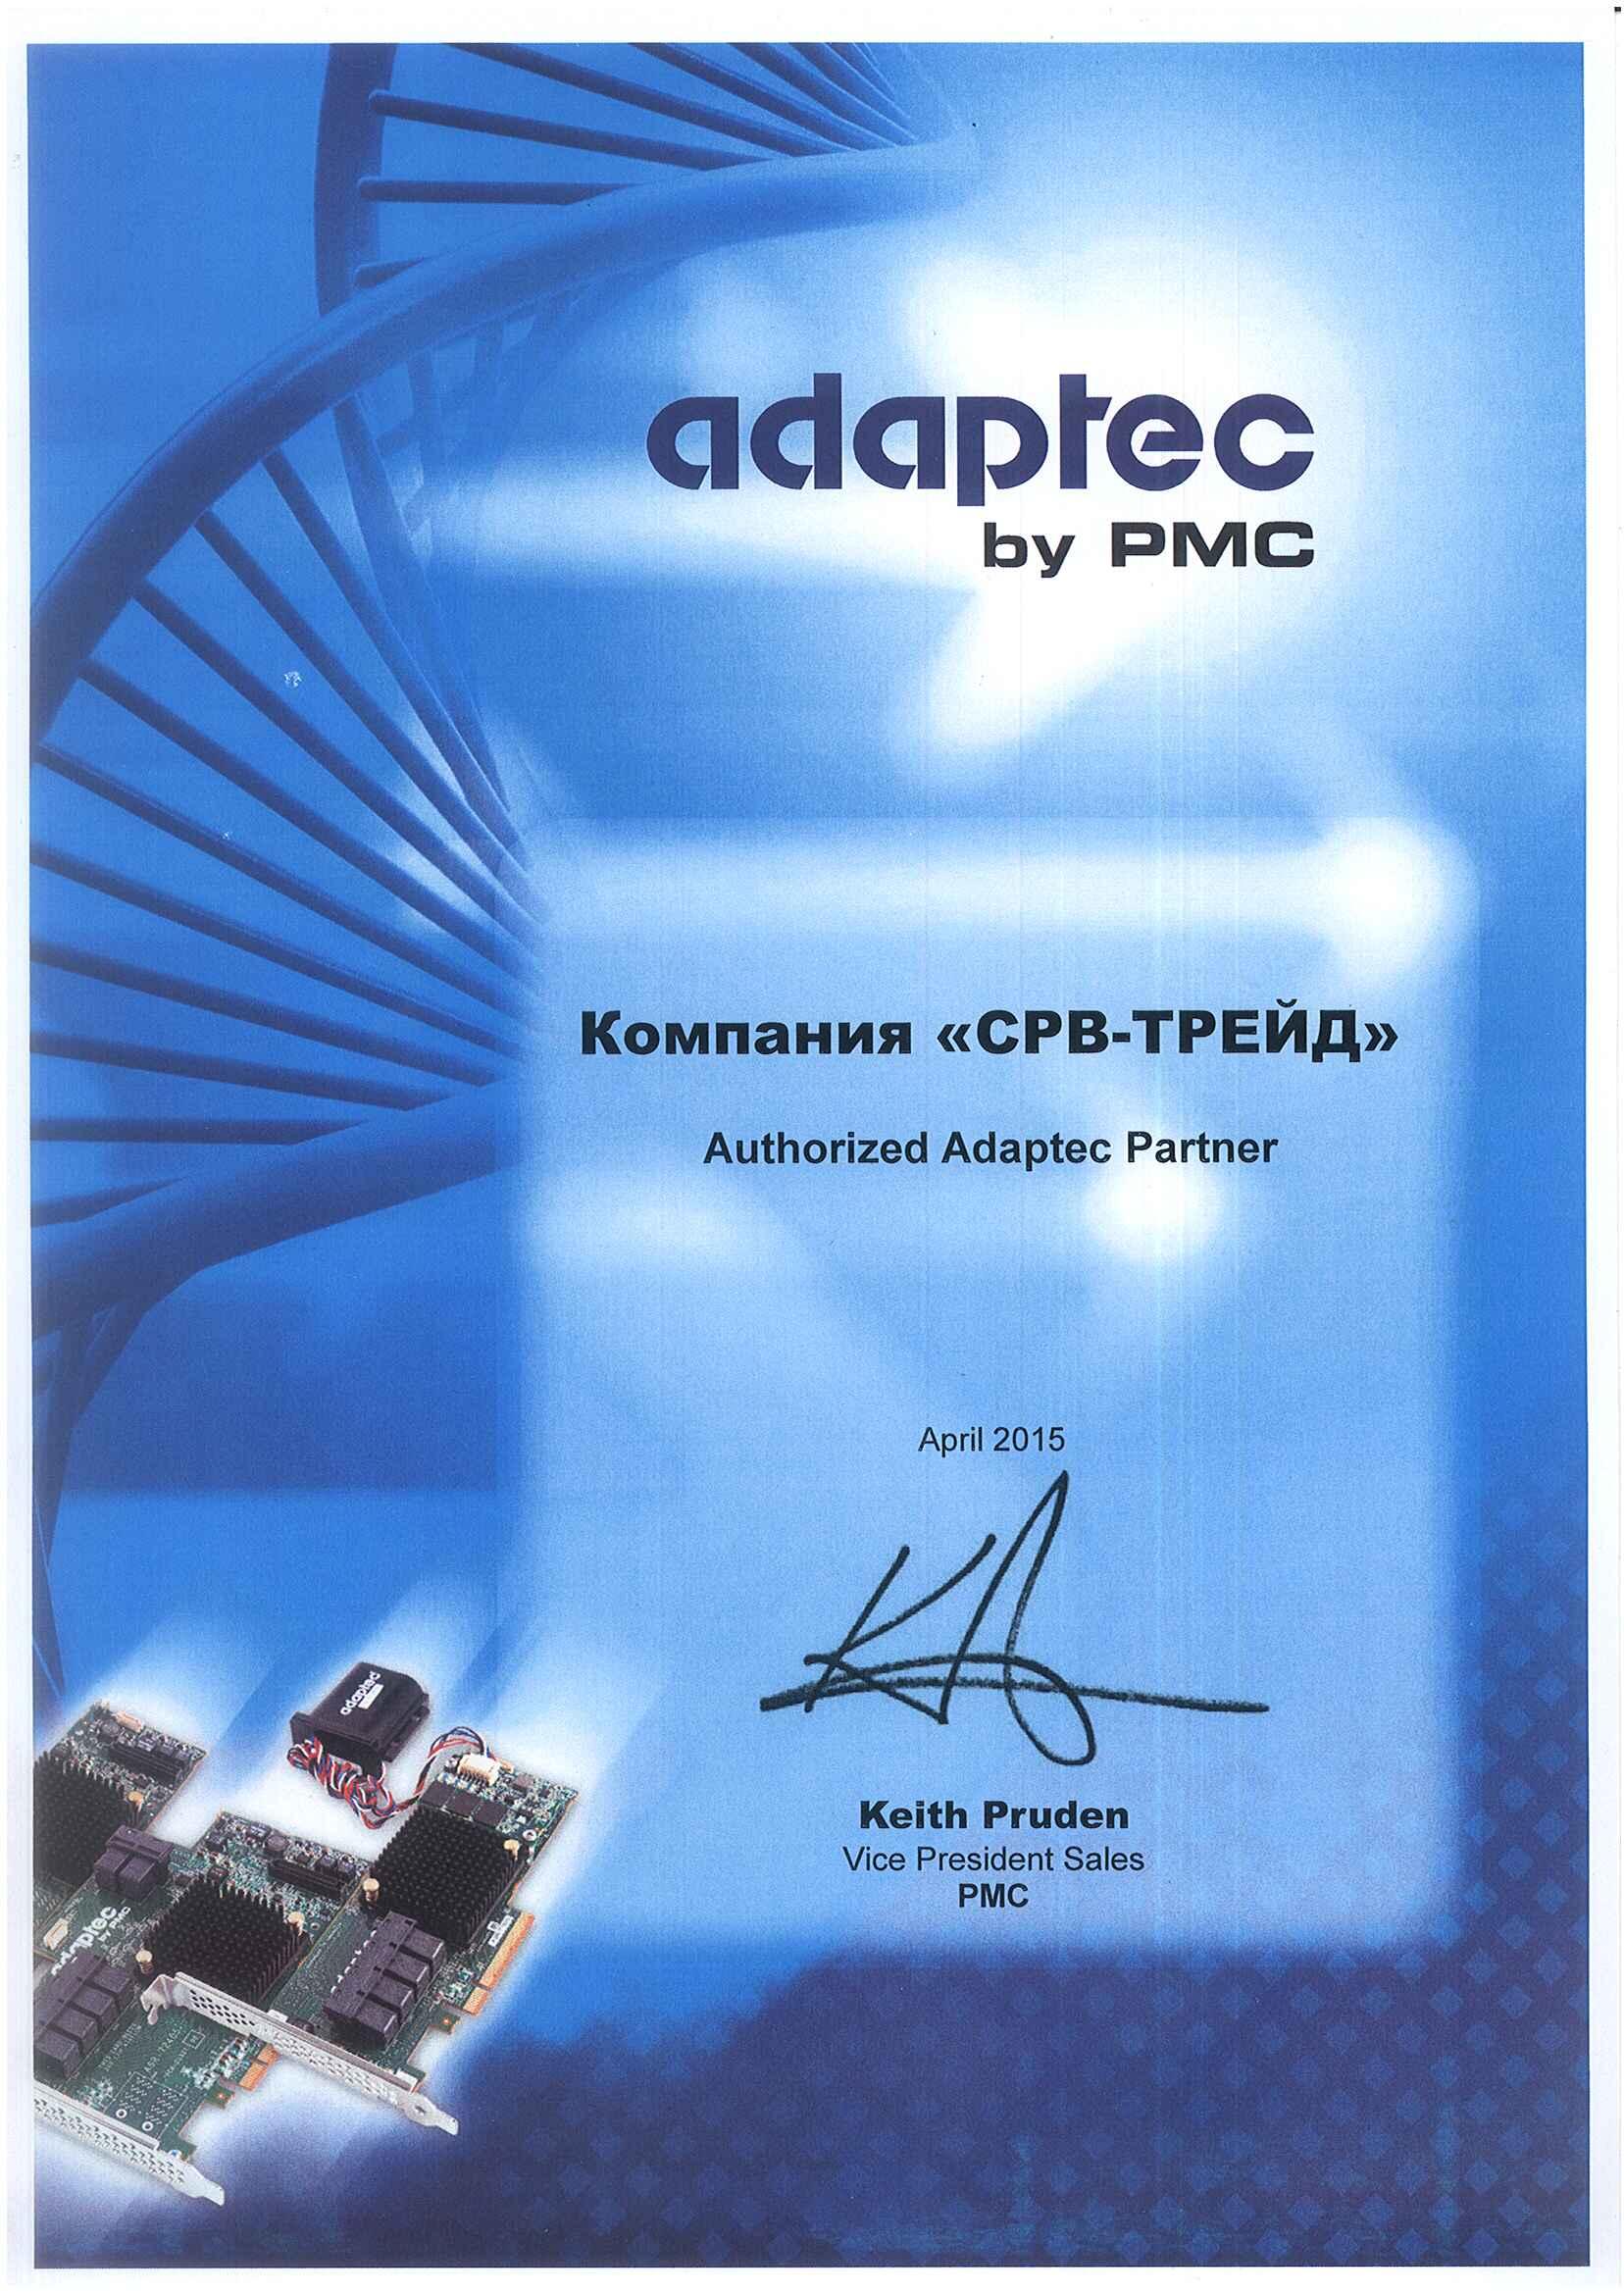 Сертификат SRV-TRADE как партнера Adaptec